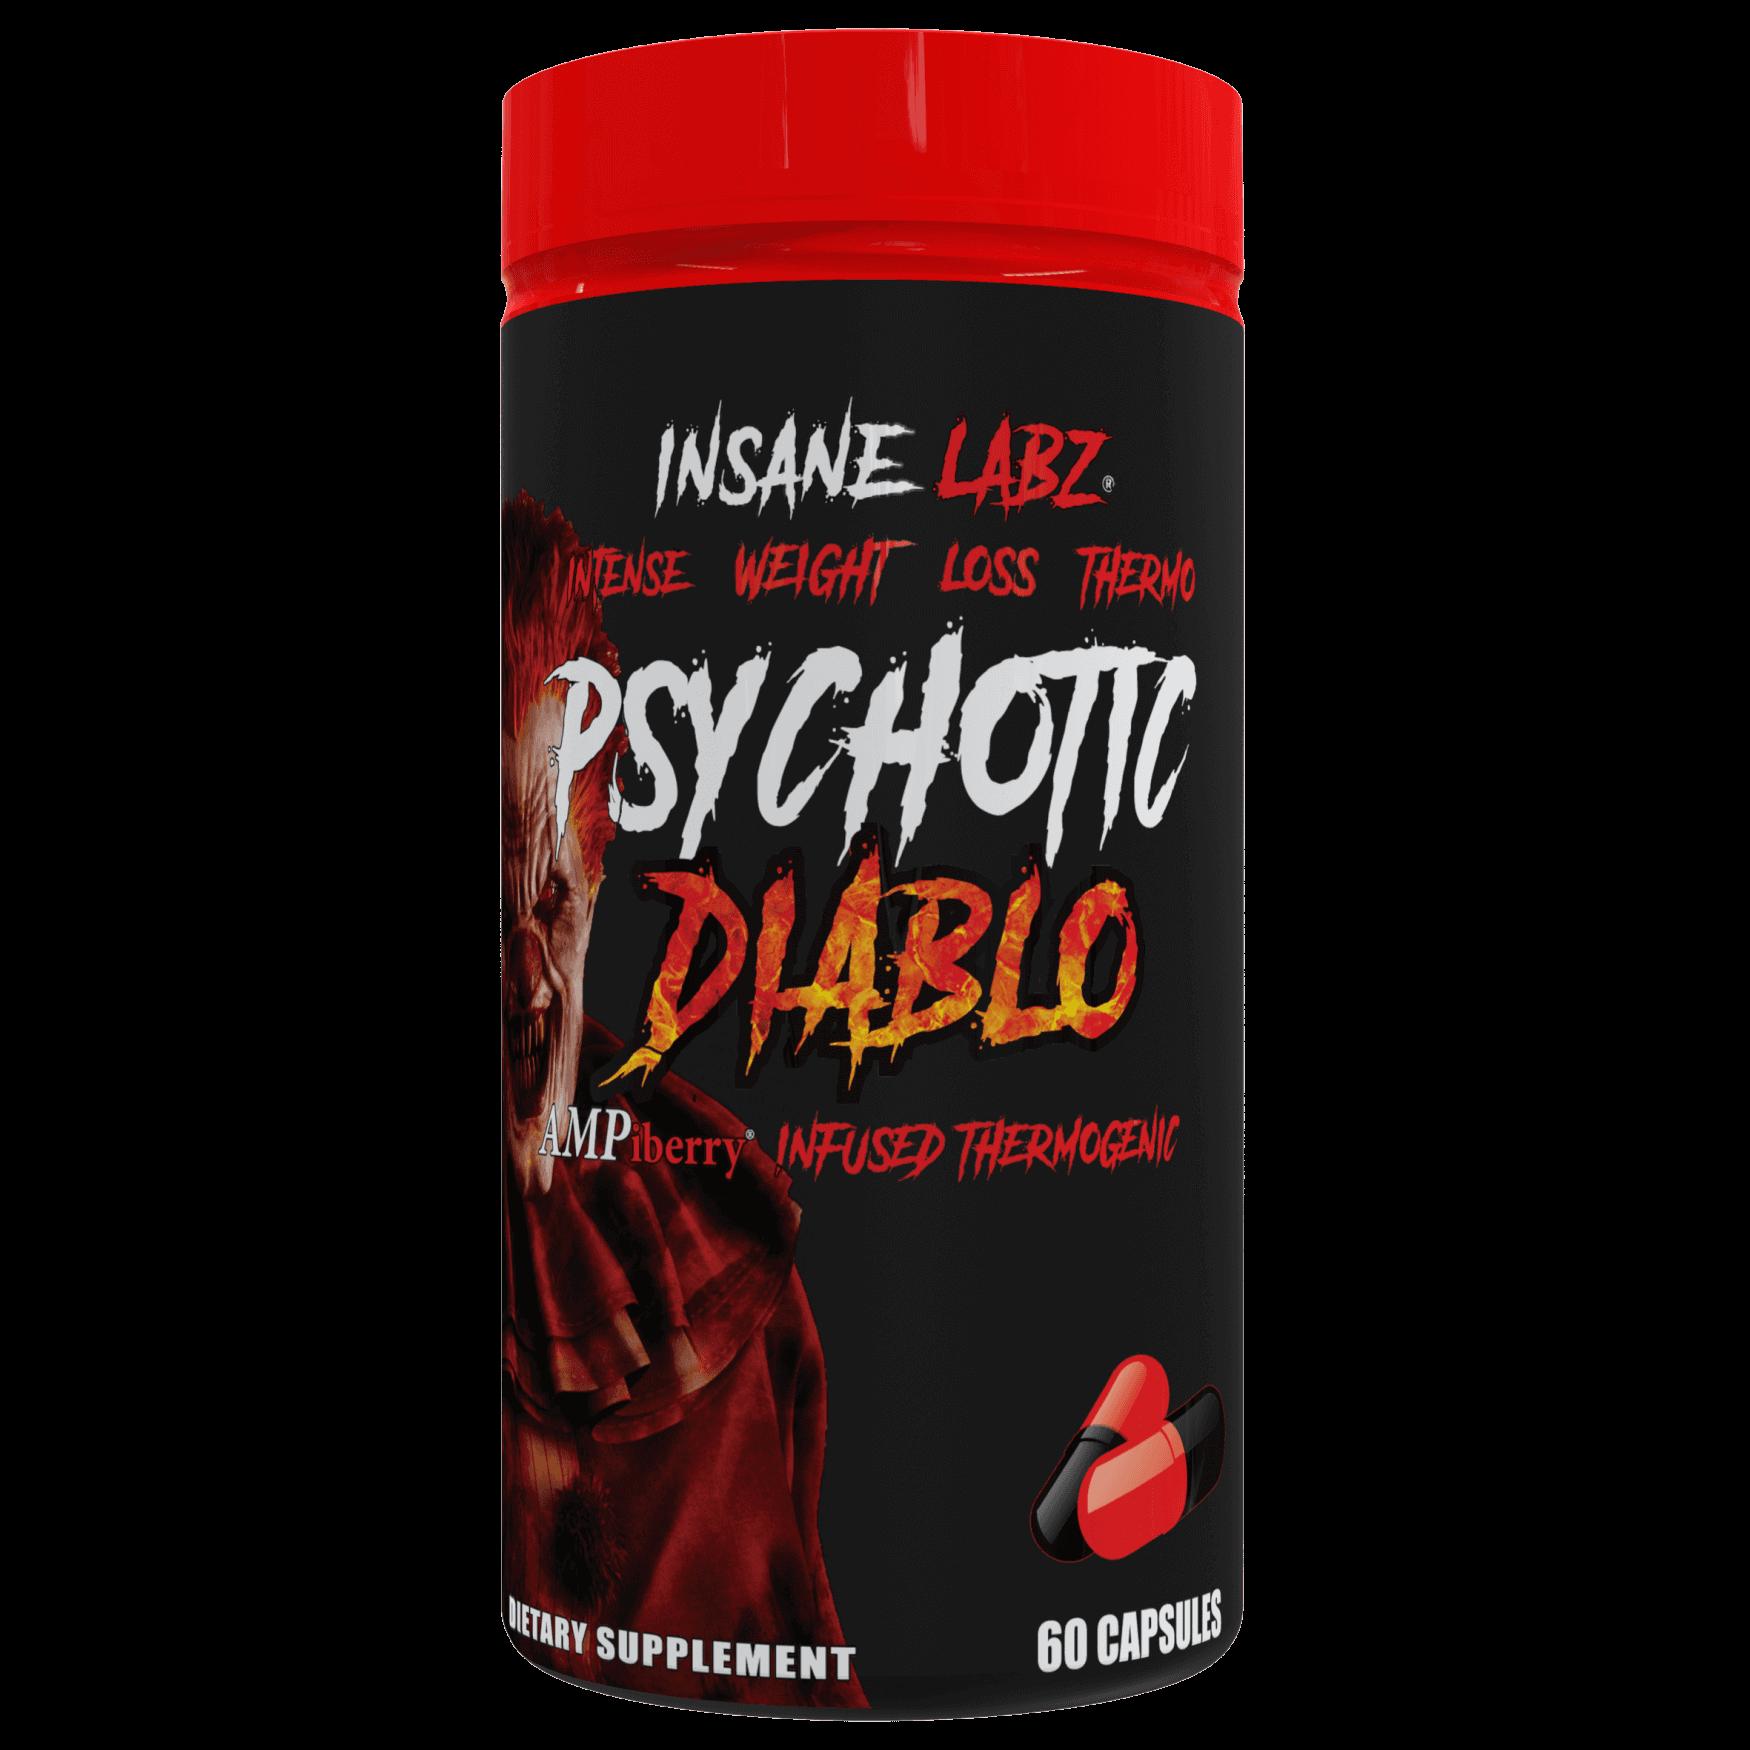 Insane Labz Psychotic Diablo 60 caps